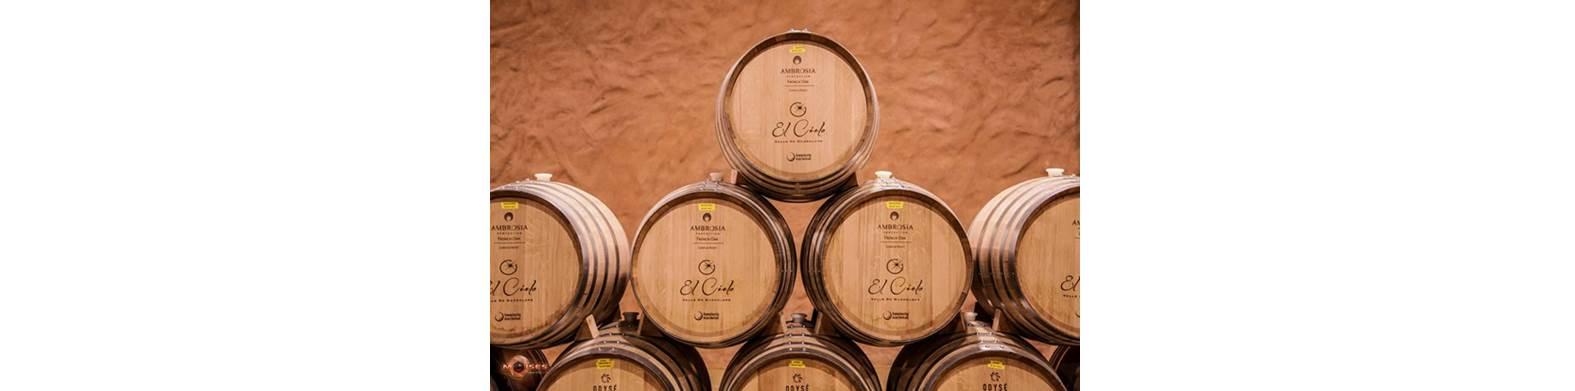 blog-du-vin.fr- vignobles EL CIELO de Valle Guadalupe